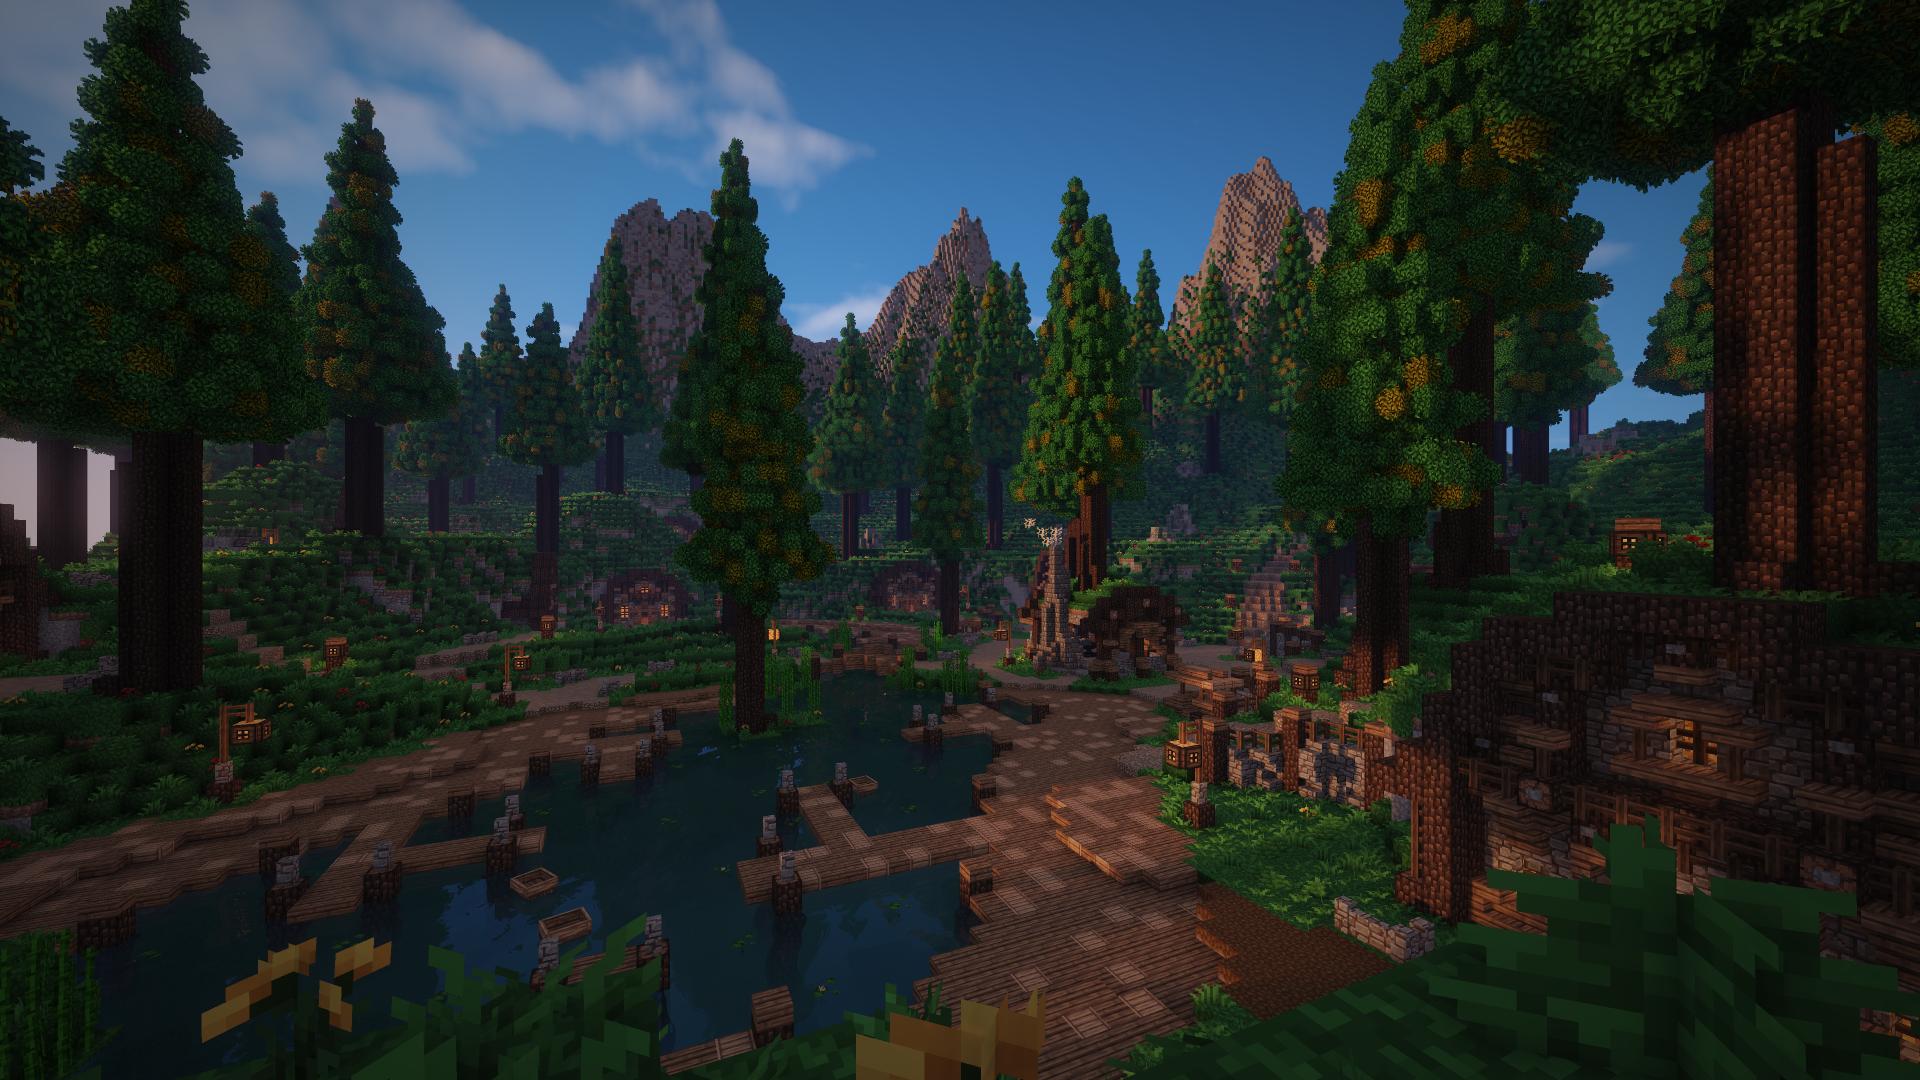 Minecraft Mod Minecraft Chocapic13 S Shaders V5 Lite